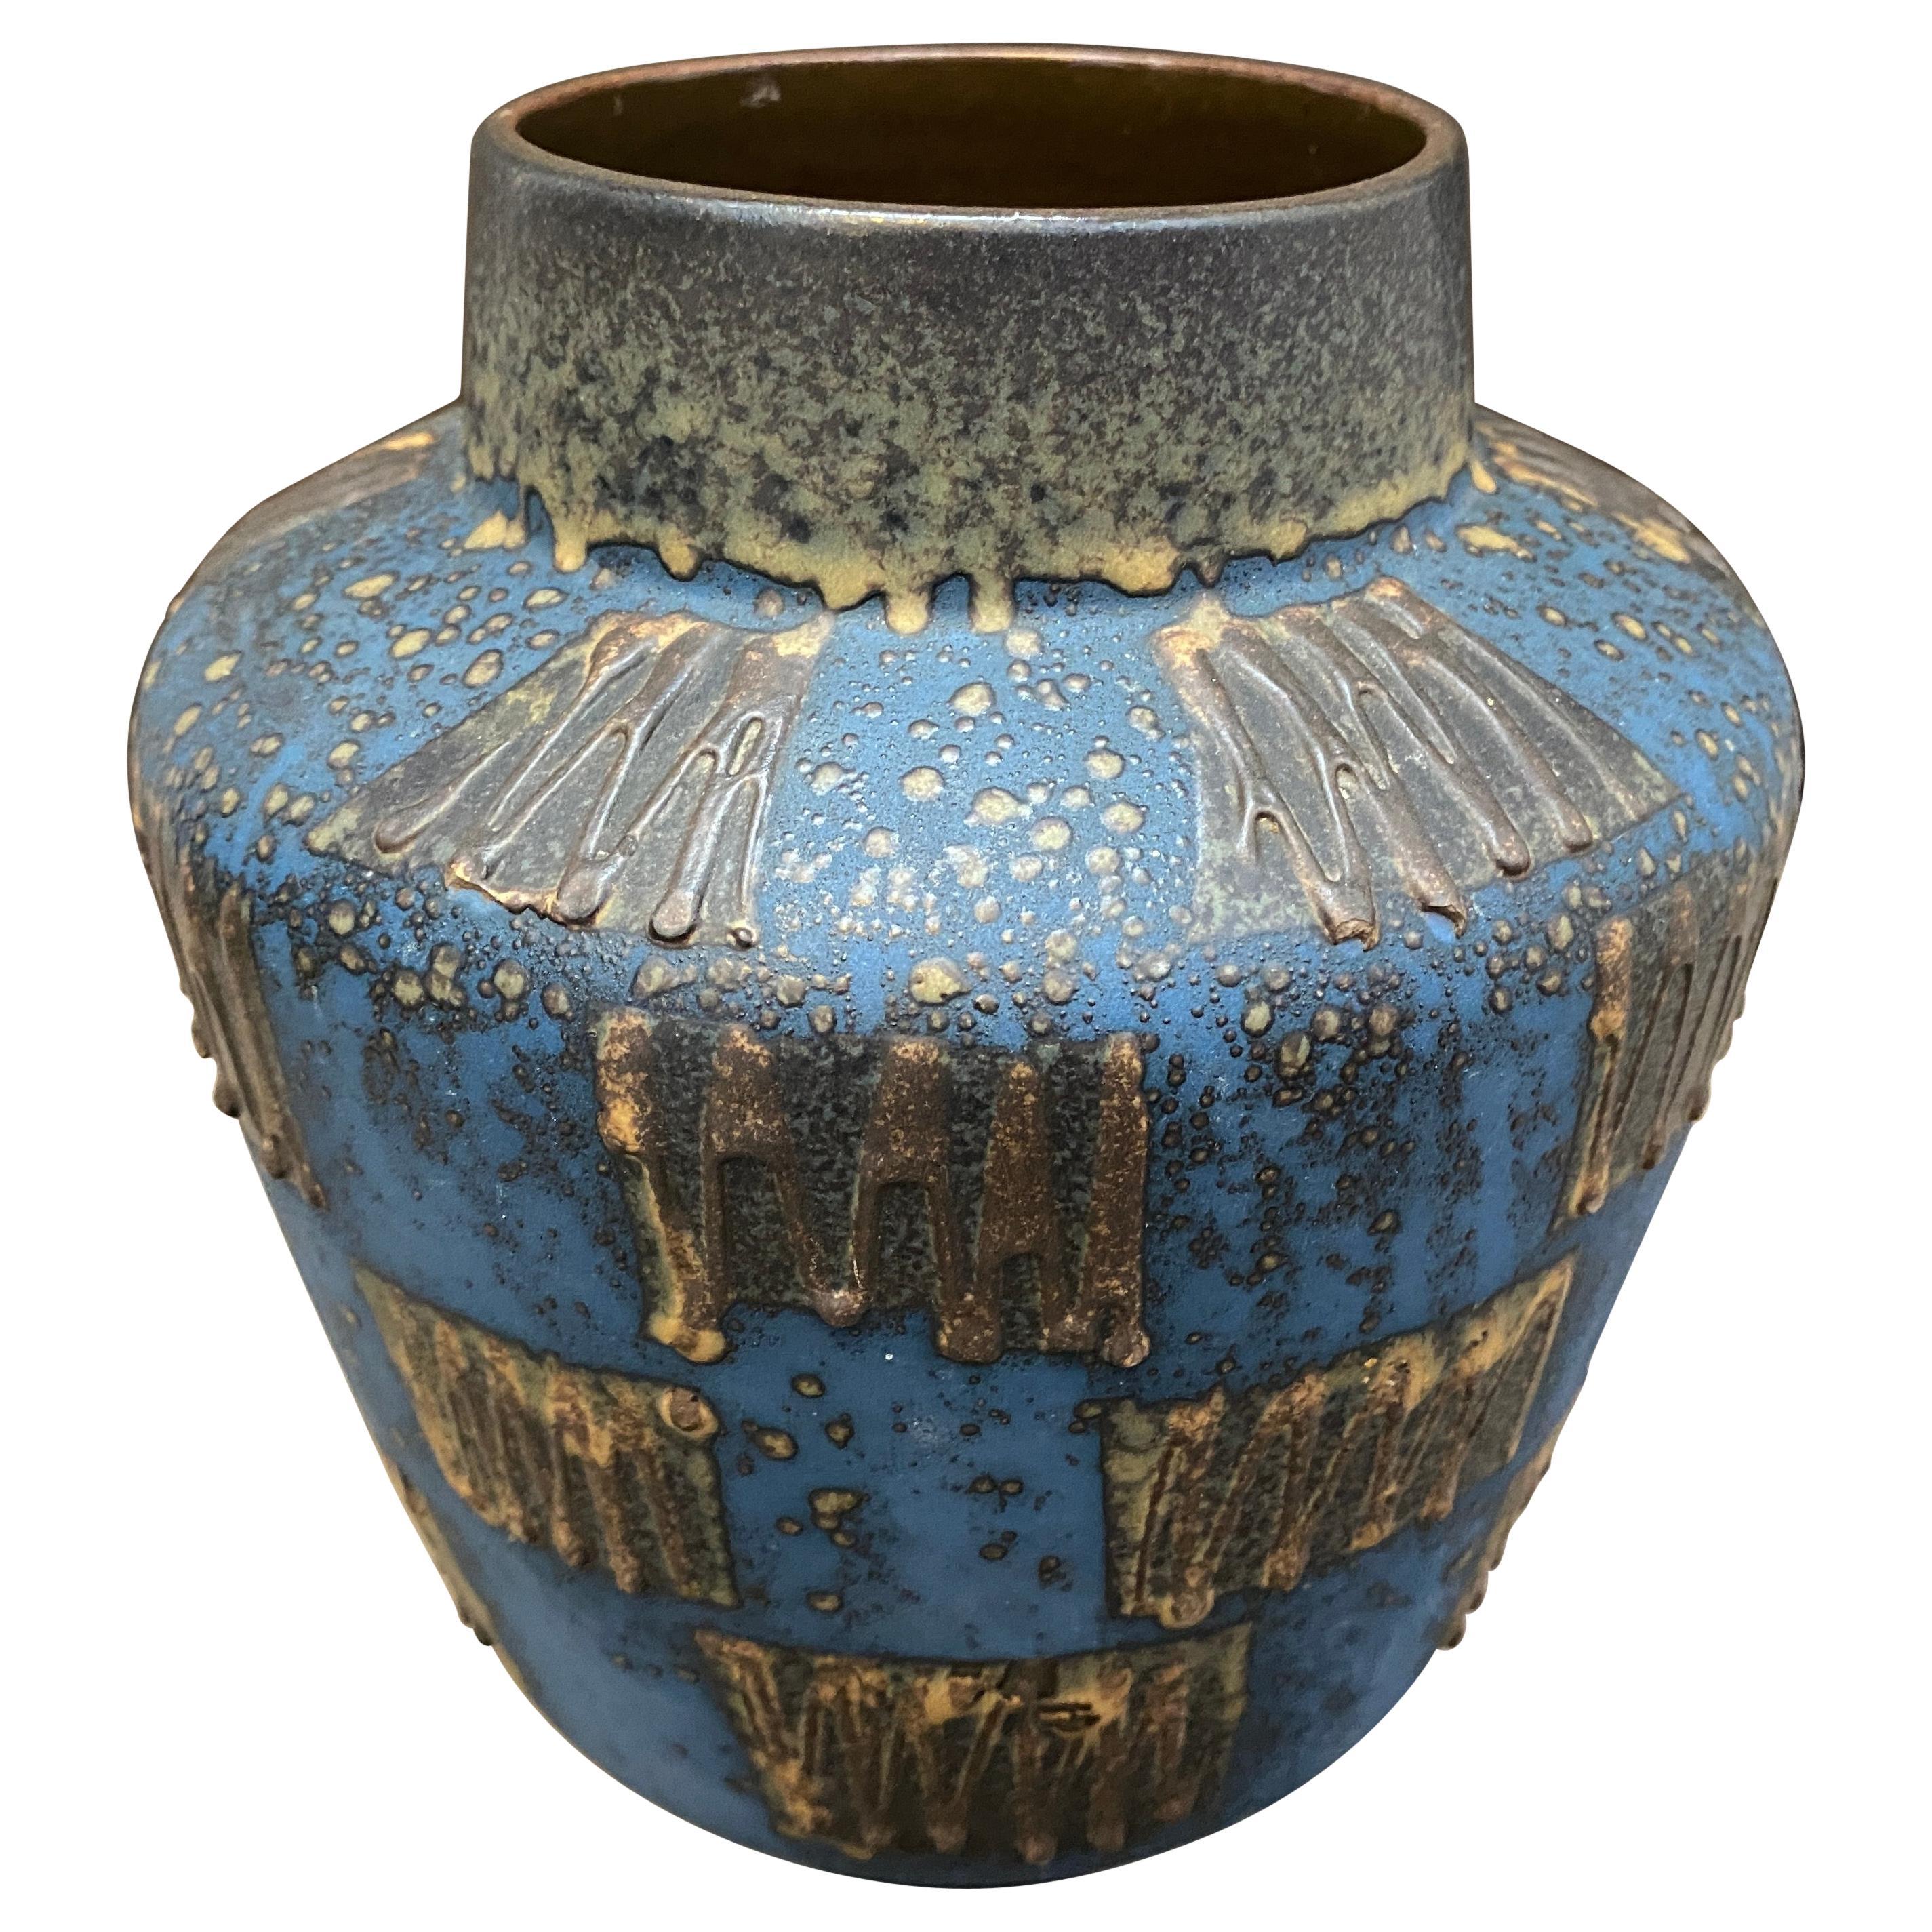 1970s Mid-Century Modern Fat Lava Ceramic German Vase by Carstens Tonnieshof